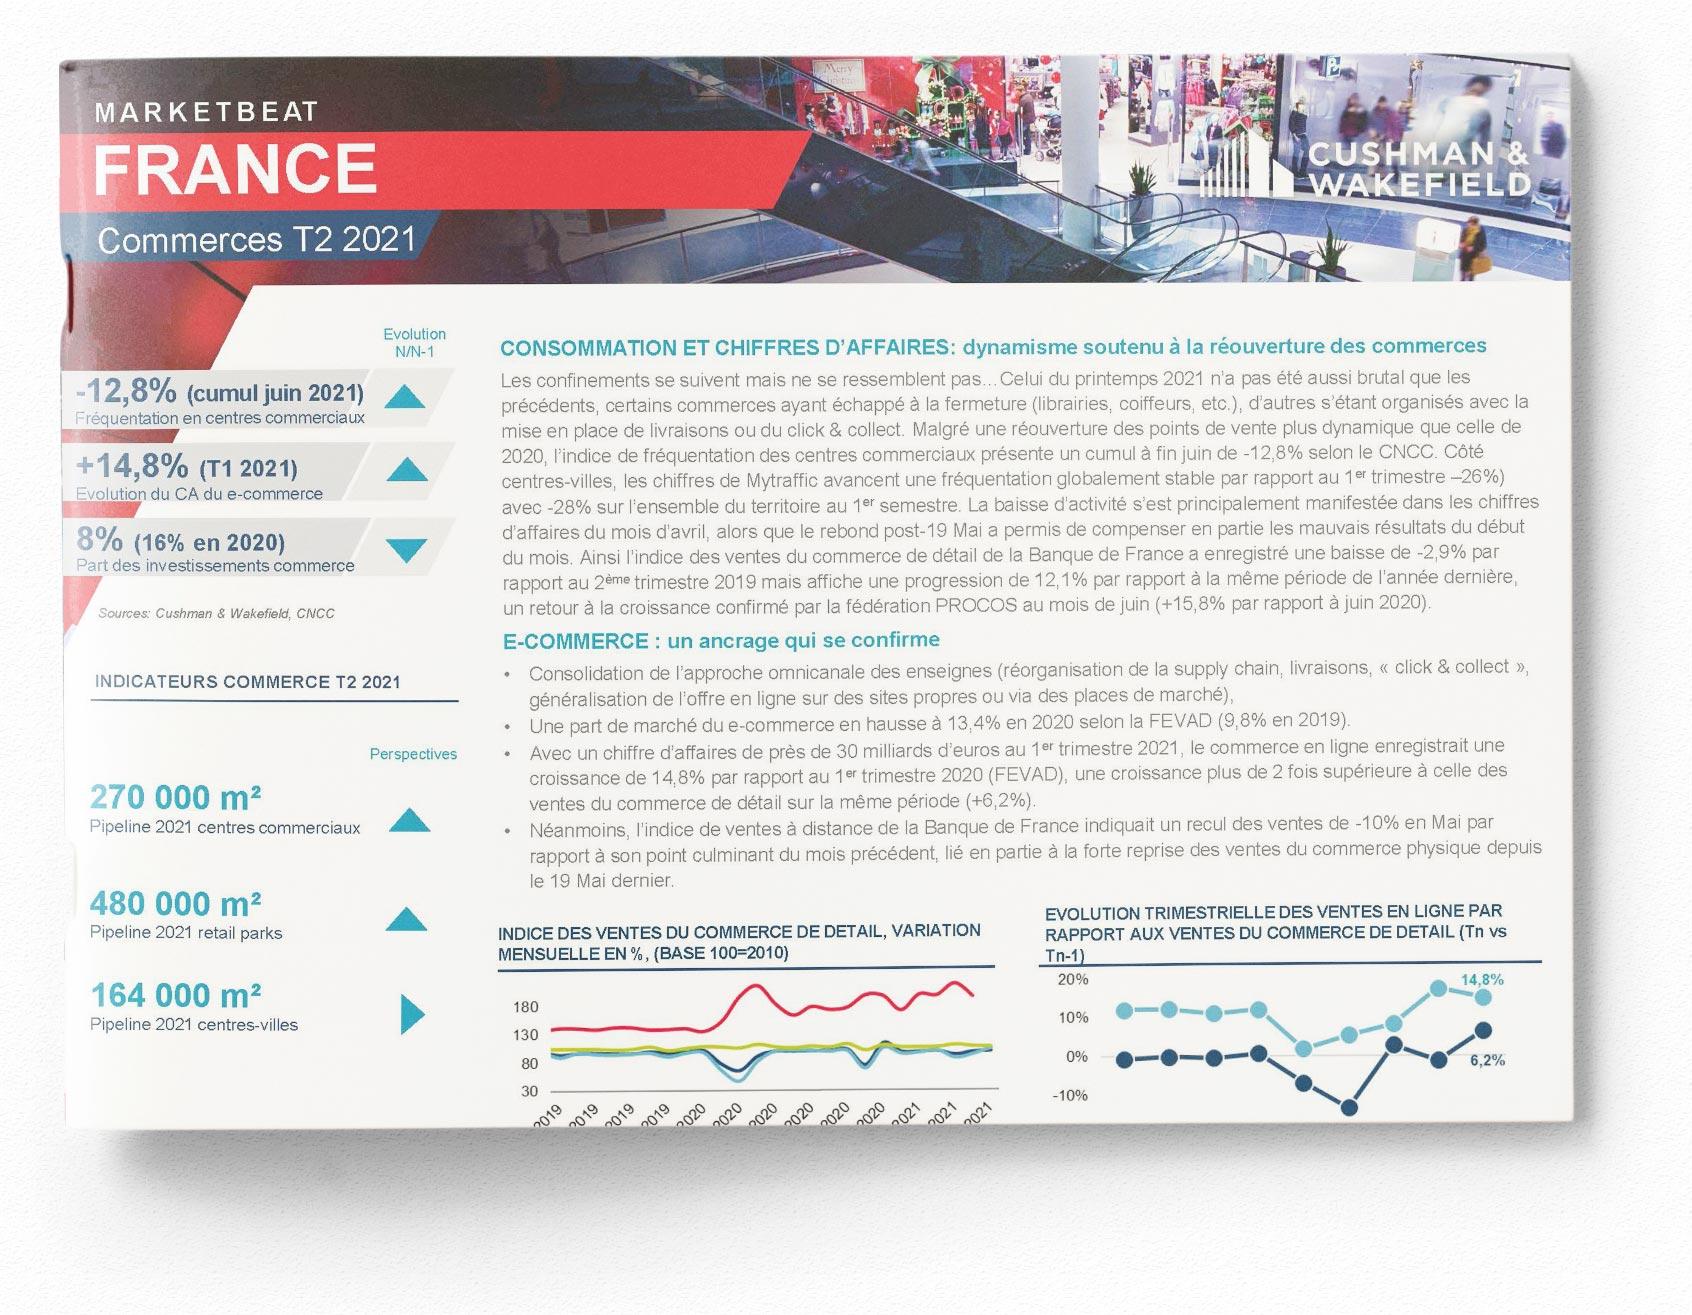 Marketbeat Commerces France (last report)